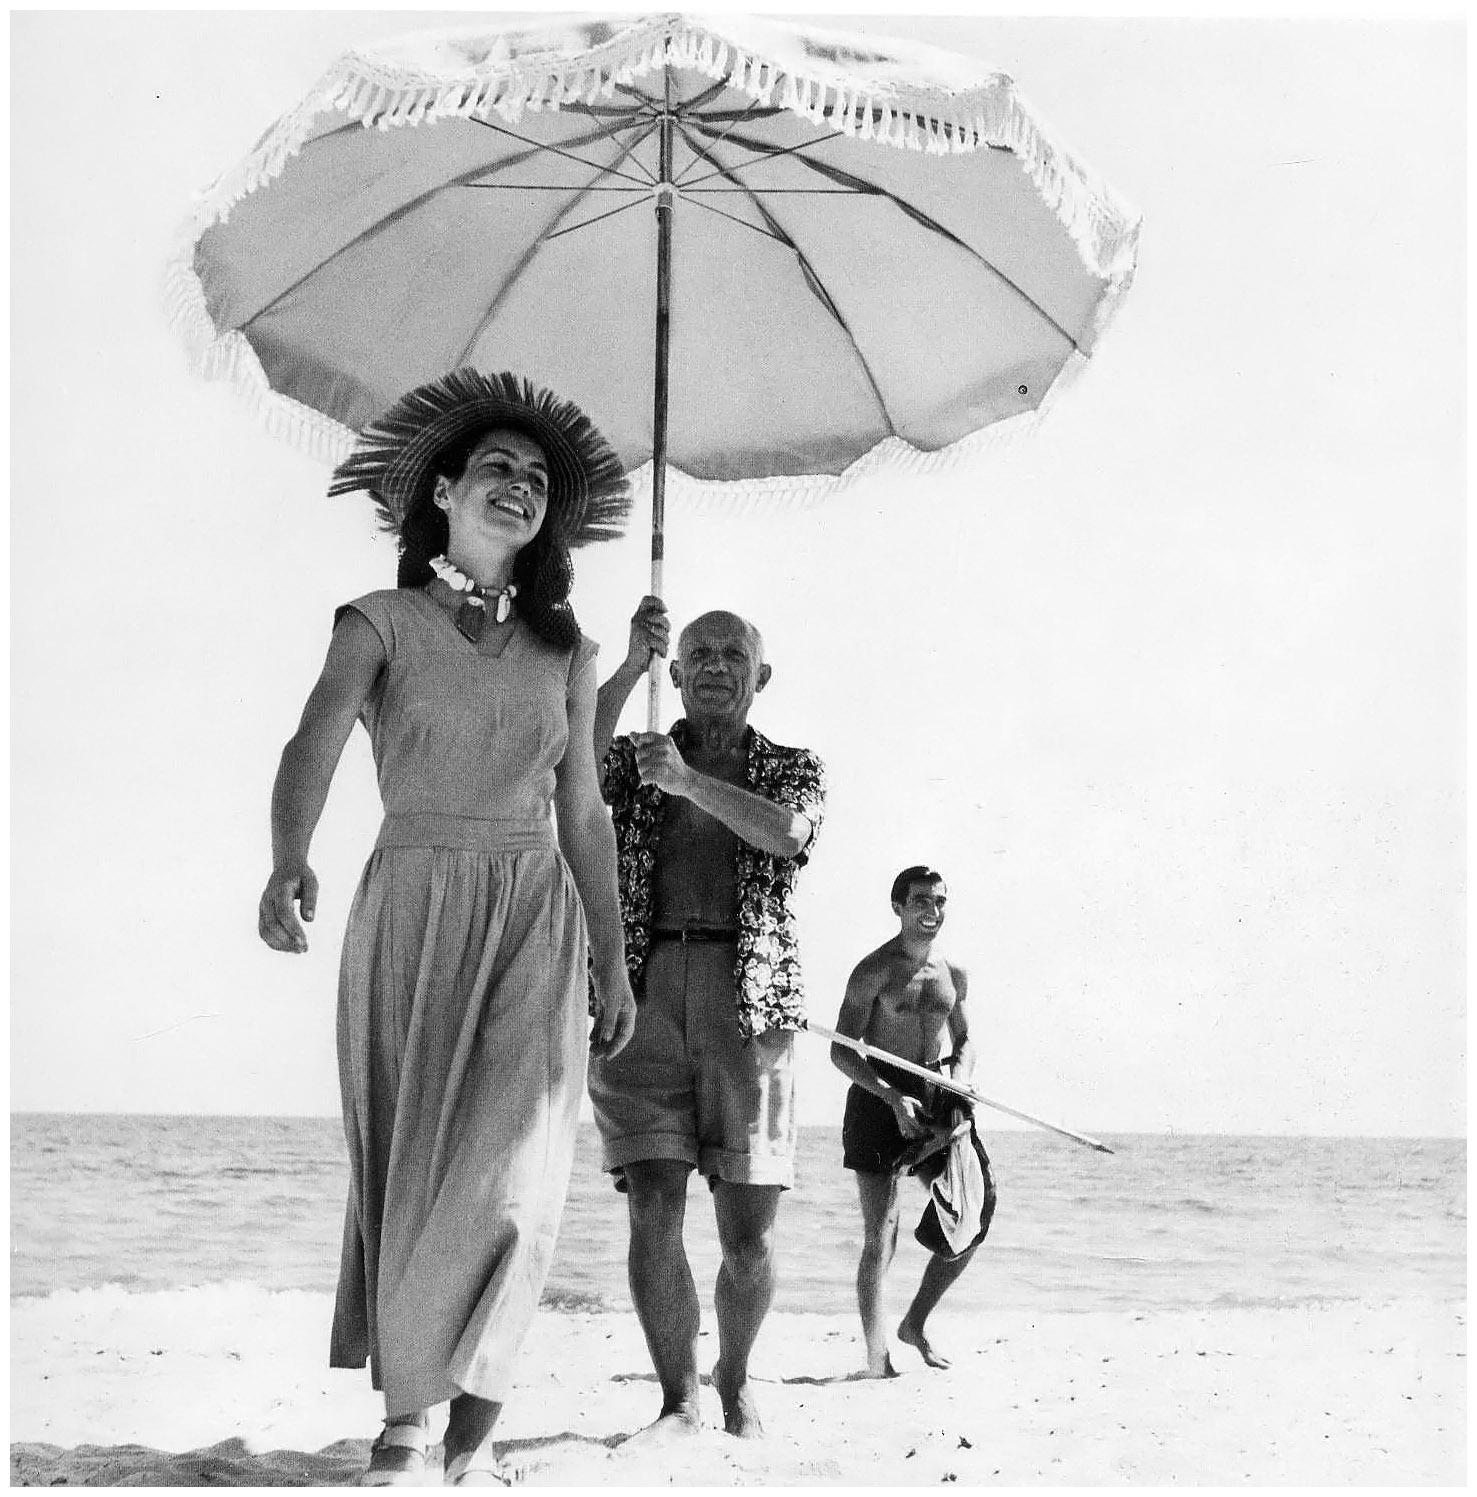 pablo-picasso-francoise-gilot-1951-photo-robert-capa